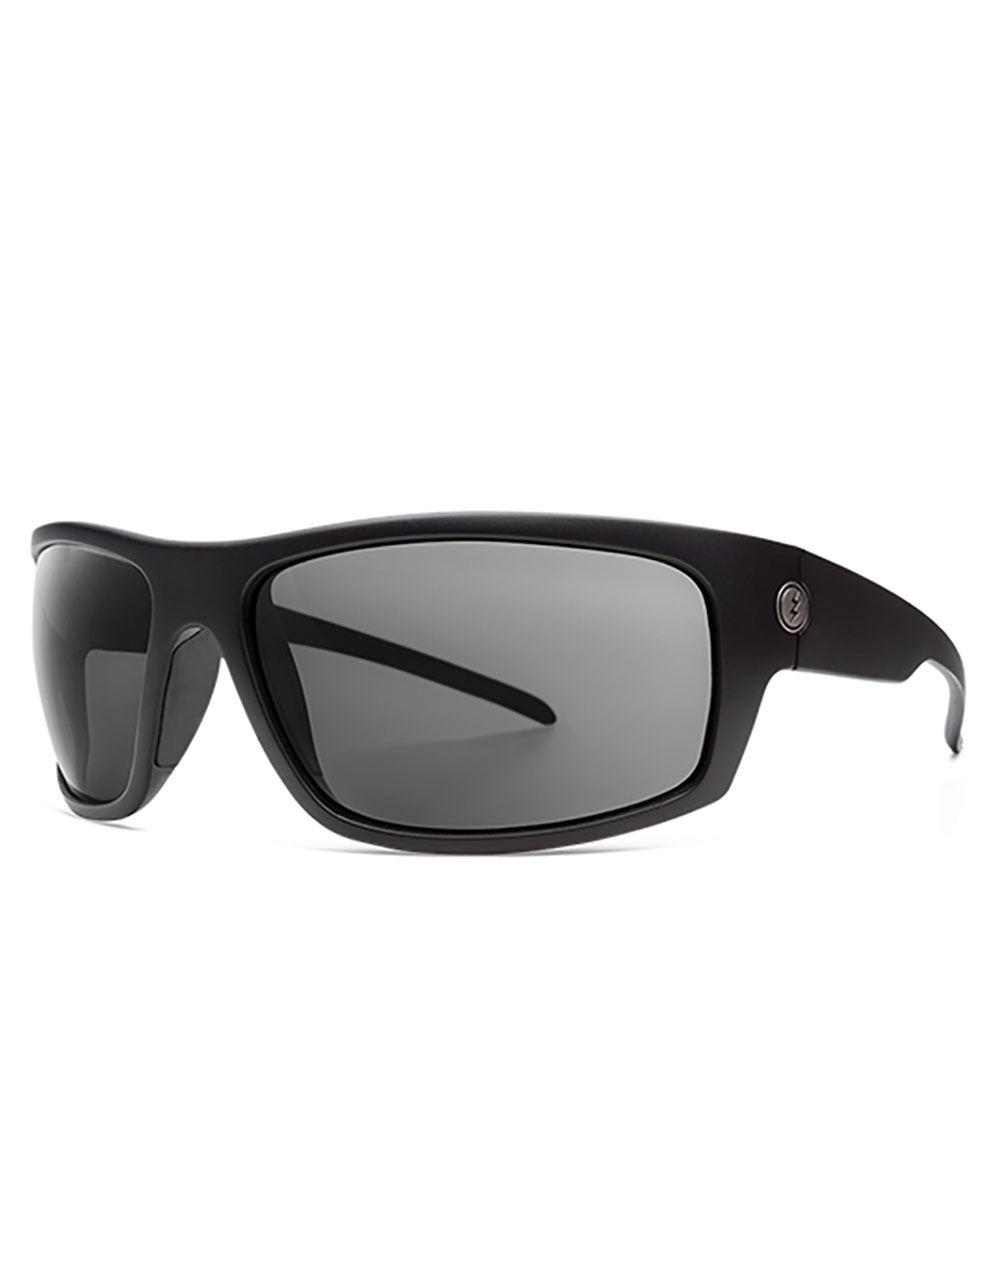 ELECTRIC Tech One XLS Matte Black & Ohm Polar Grey Polarized Sunglasses